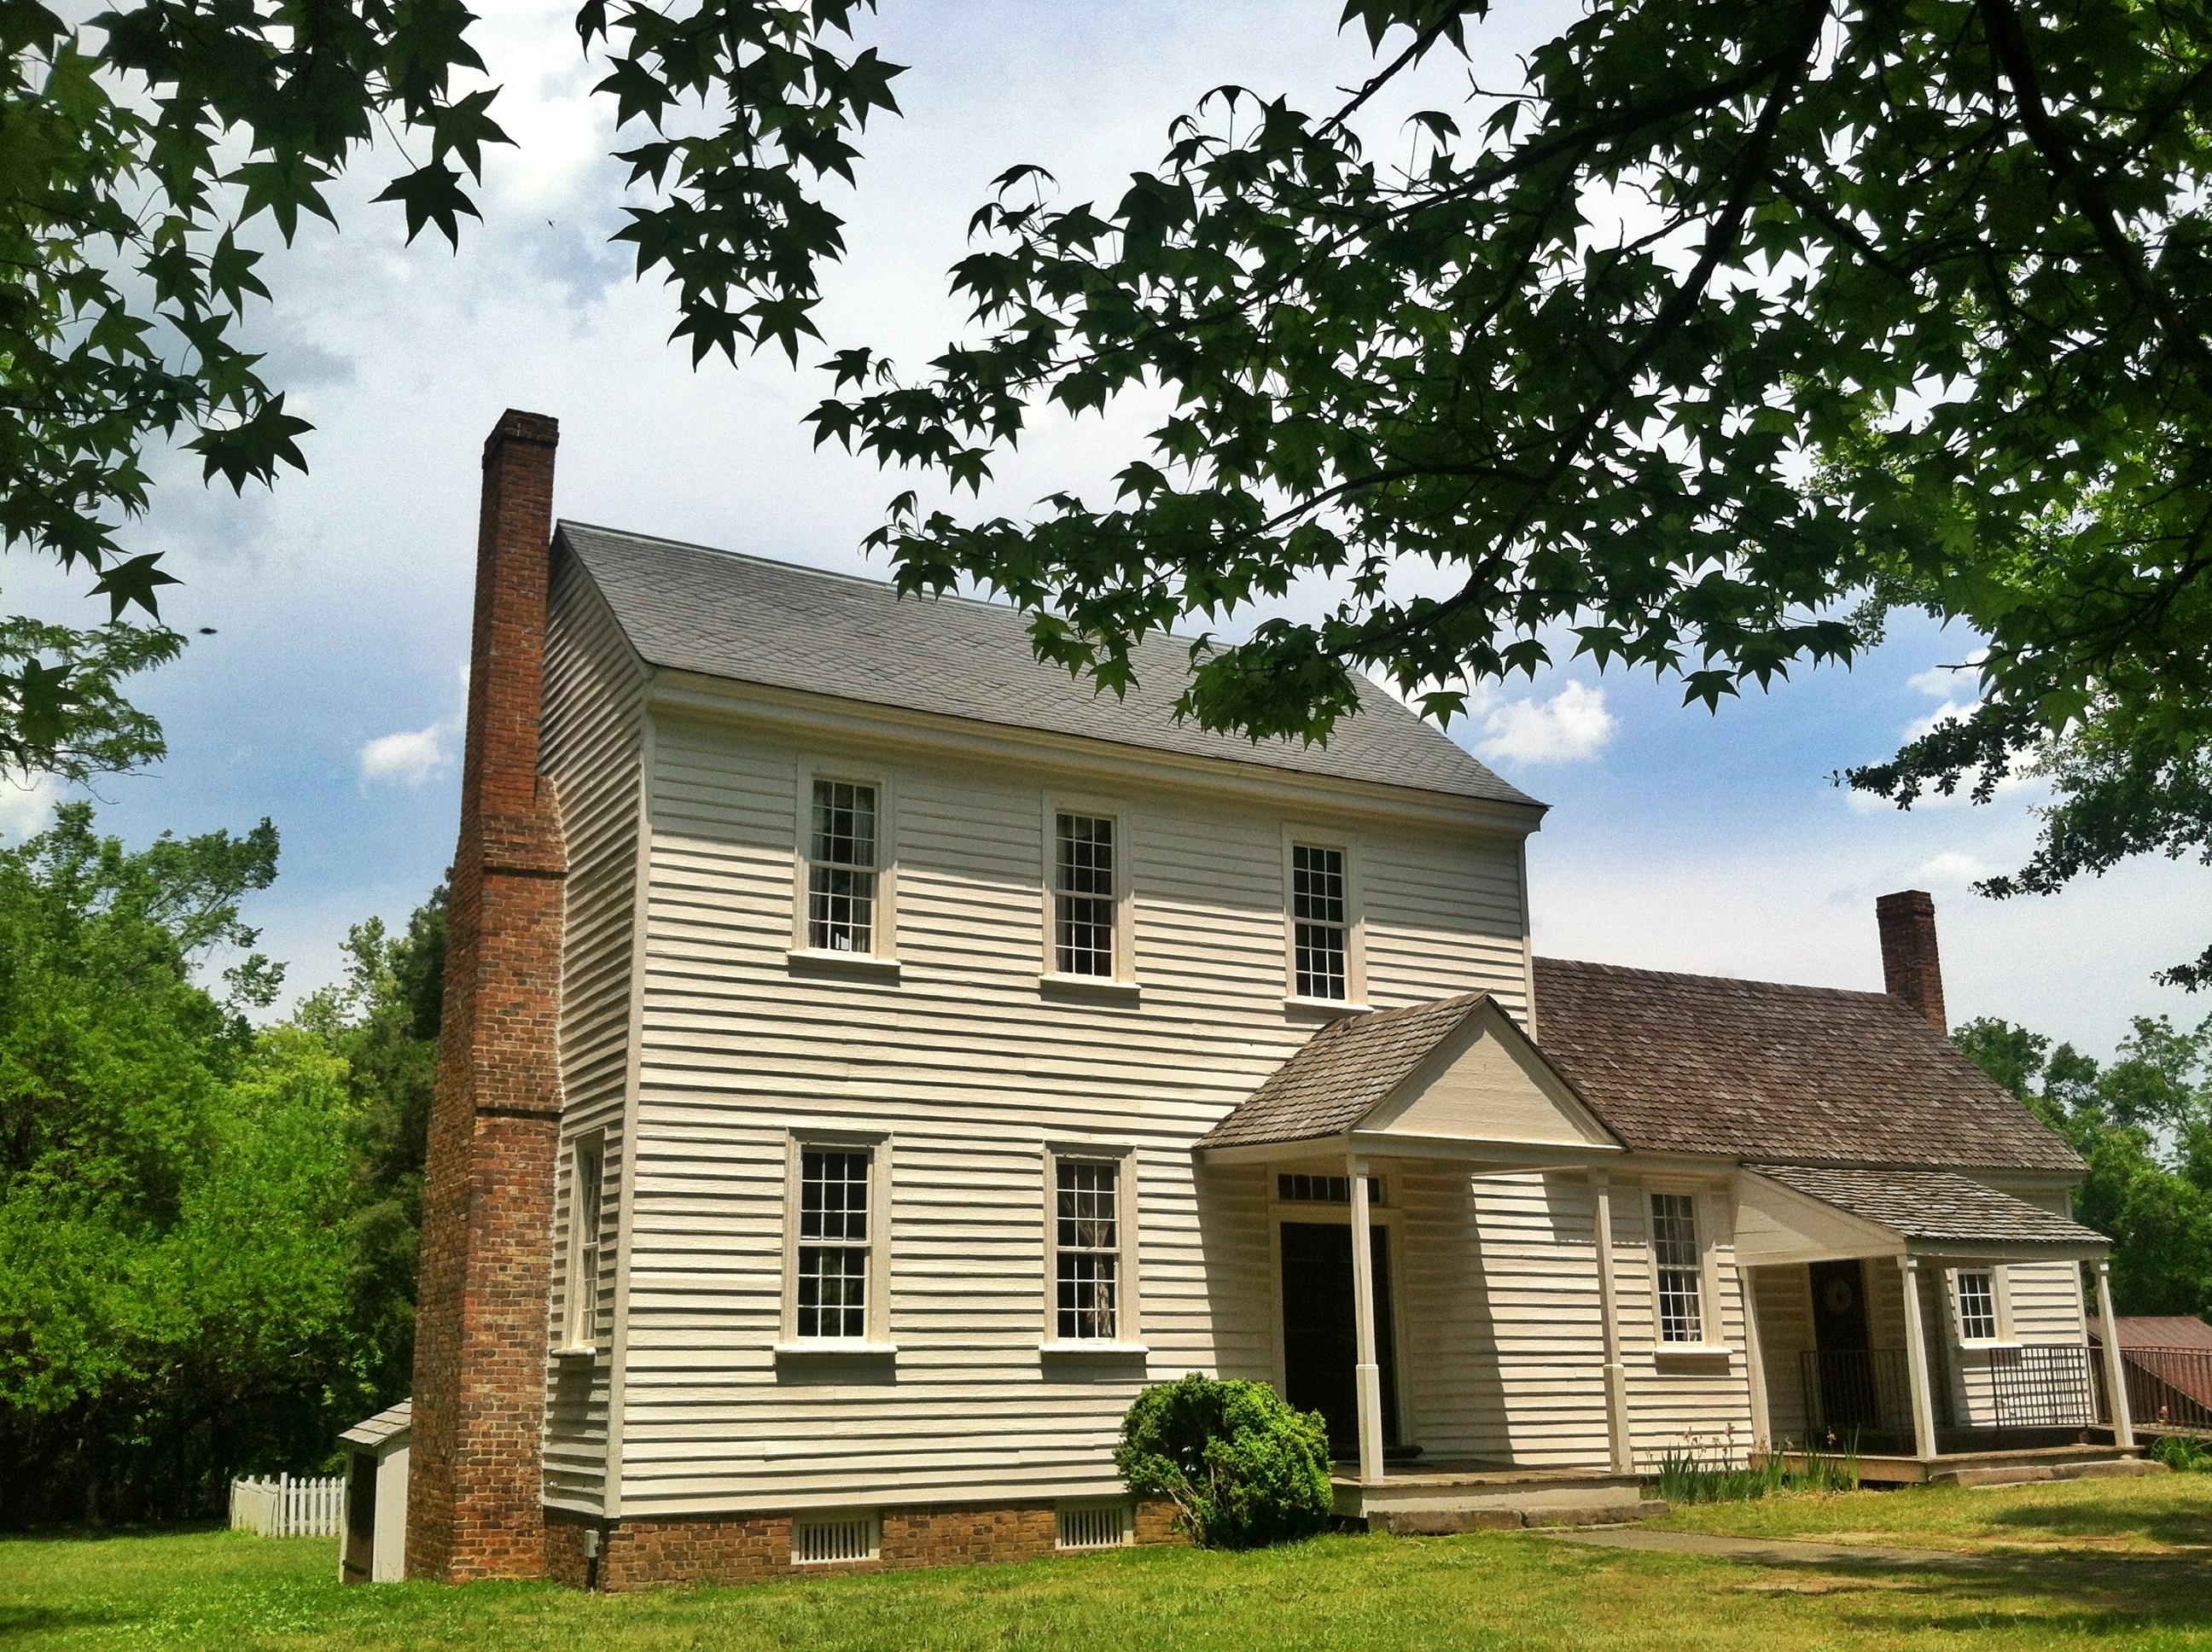 The Bennehan house